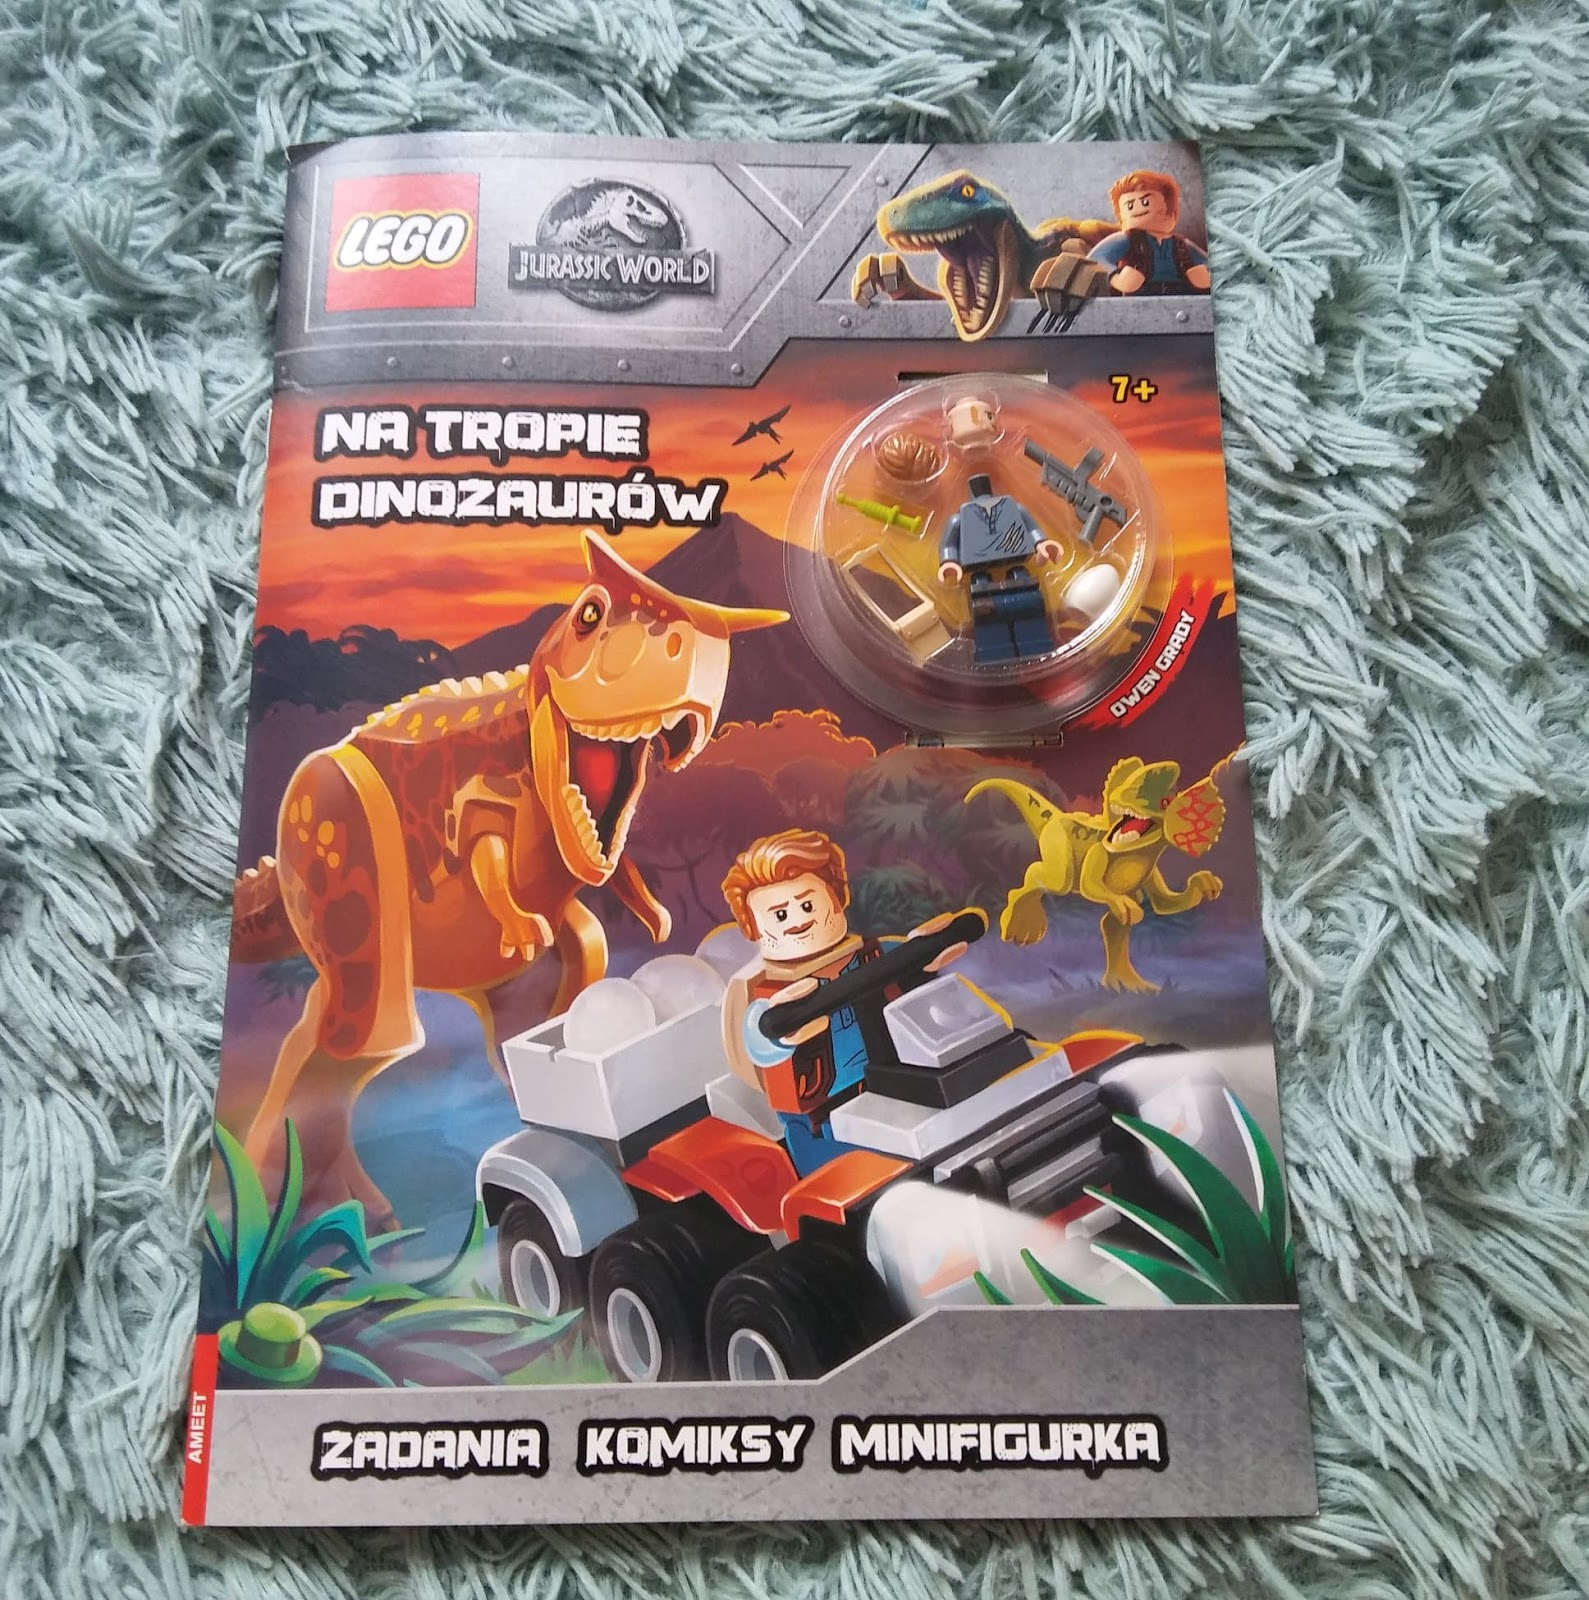 AMEET- LEGO JURASSIC WORLD. Na tropie dinozaurów